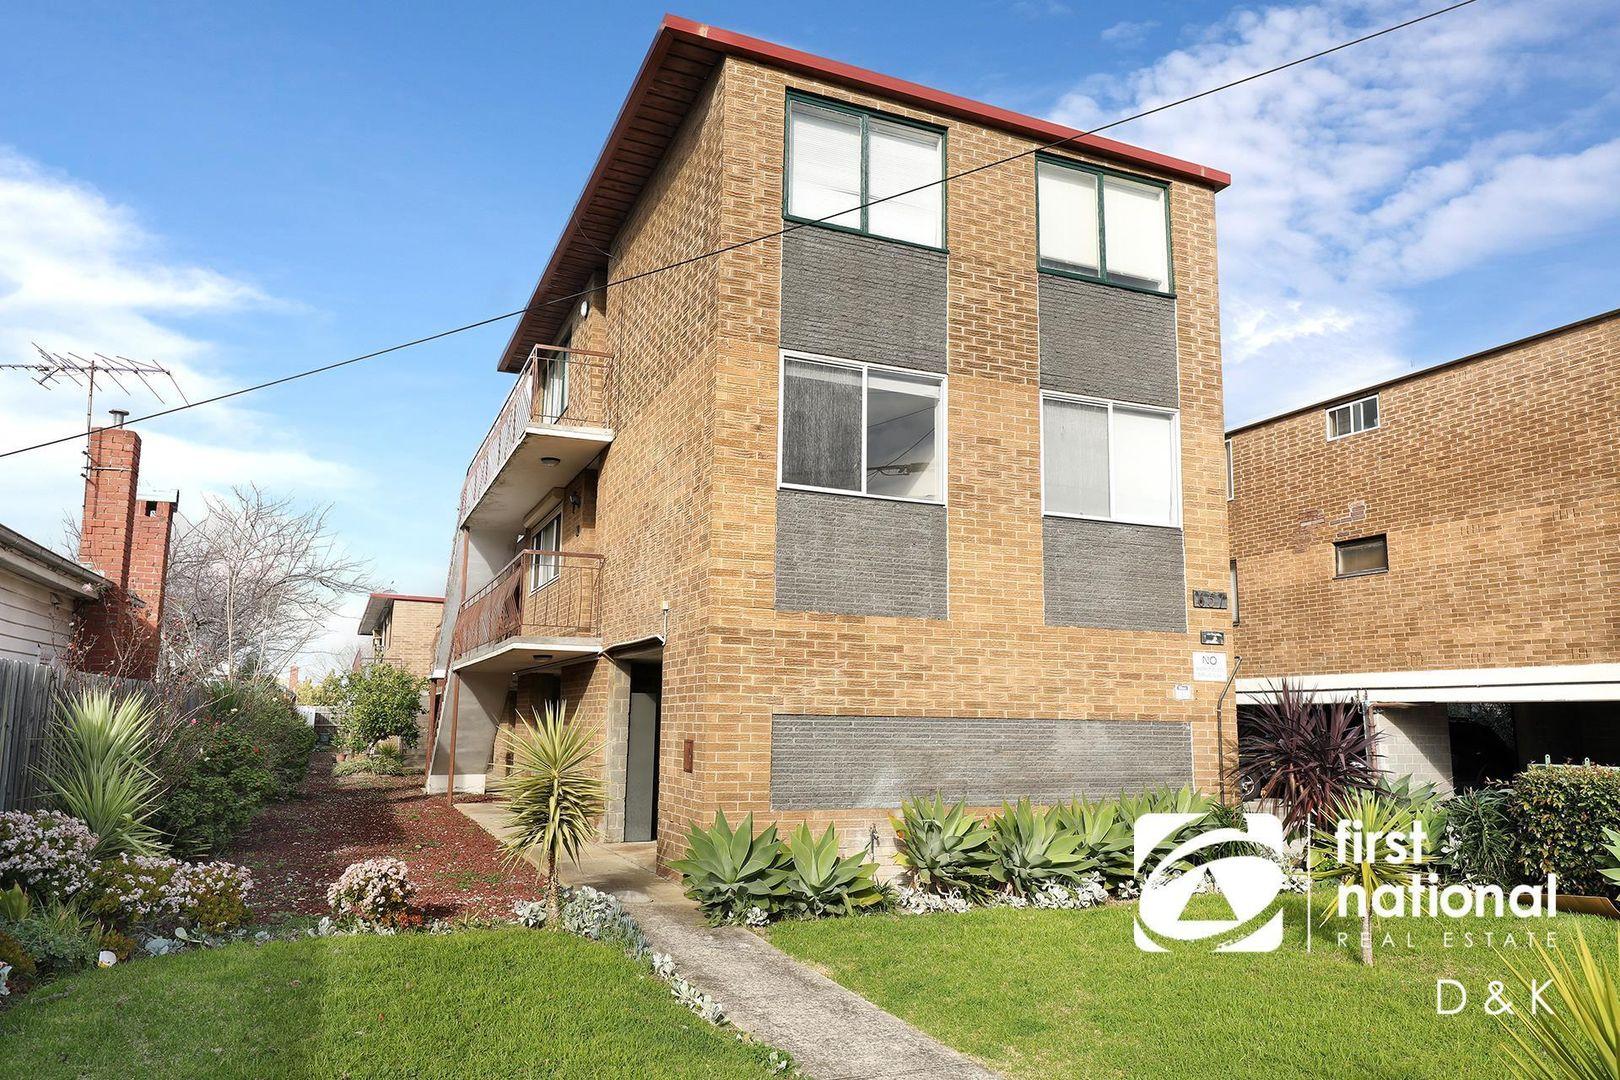 2/657 Barkly Street, West Footscray VIC 3012, Image 1